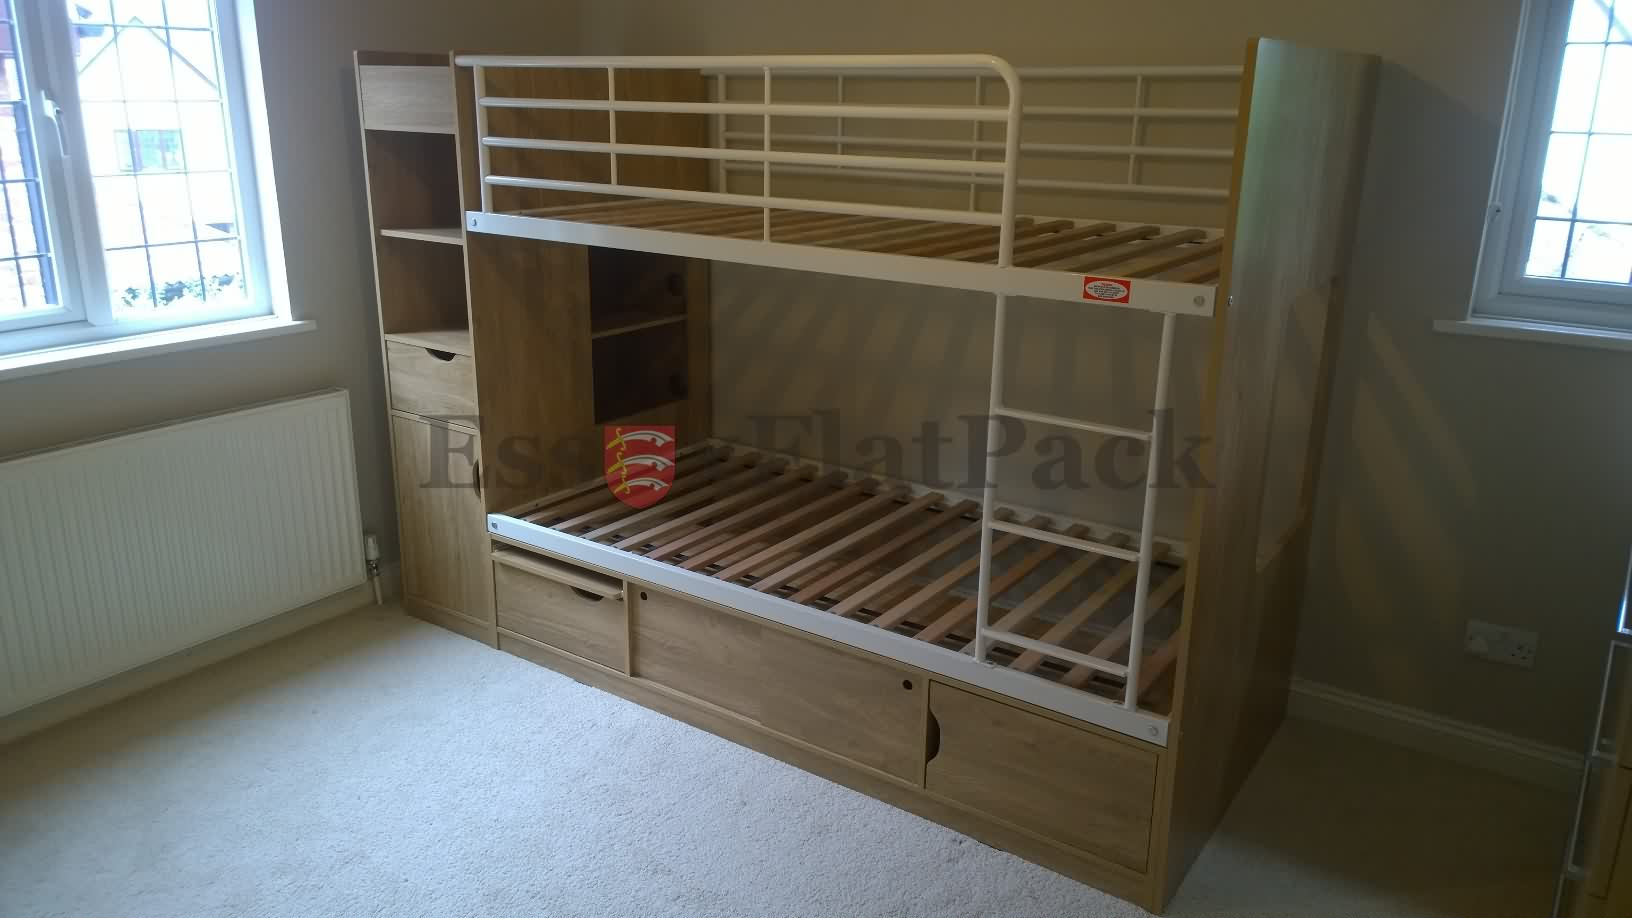 essexflatpack-cabin-bunks-20150830124424.jpg